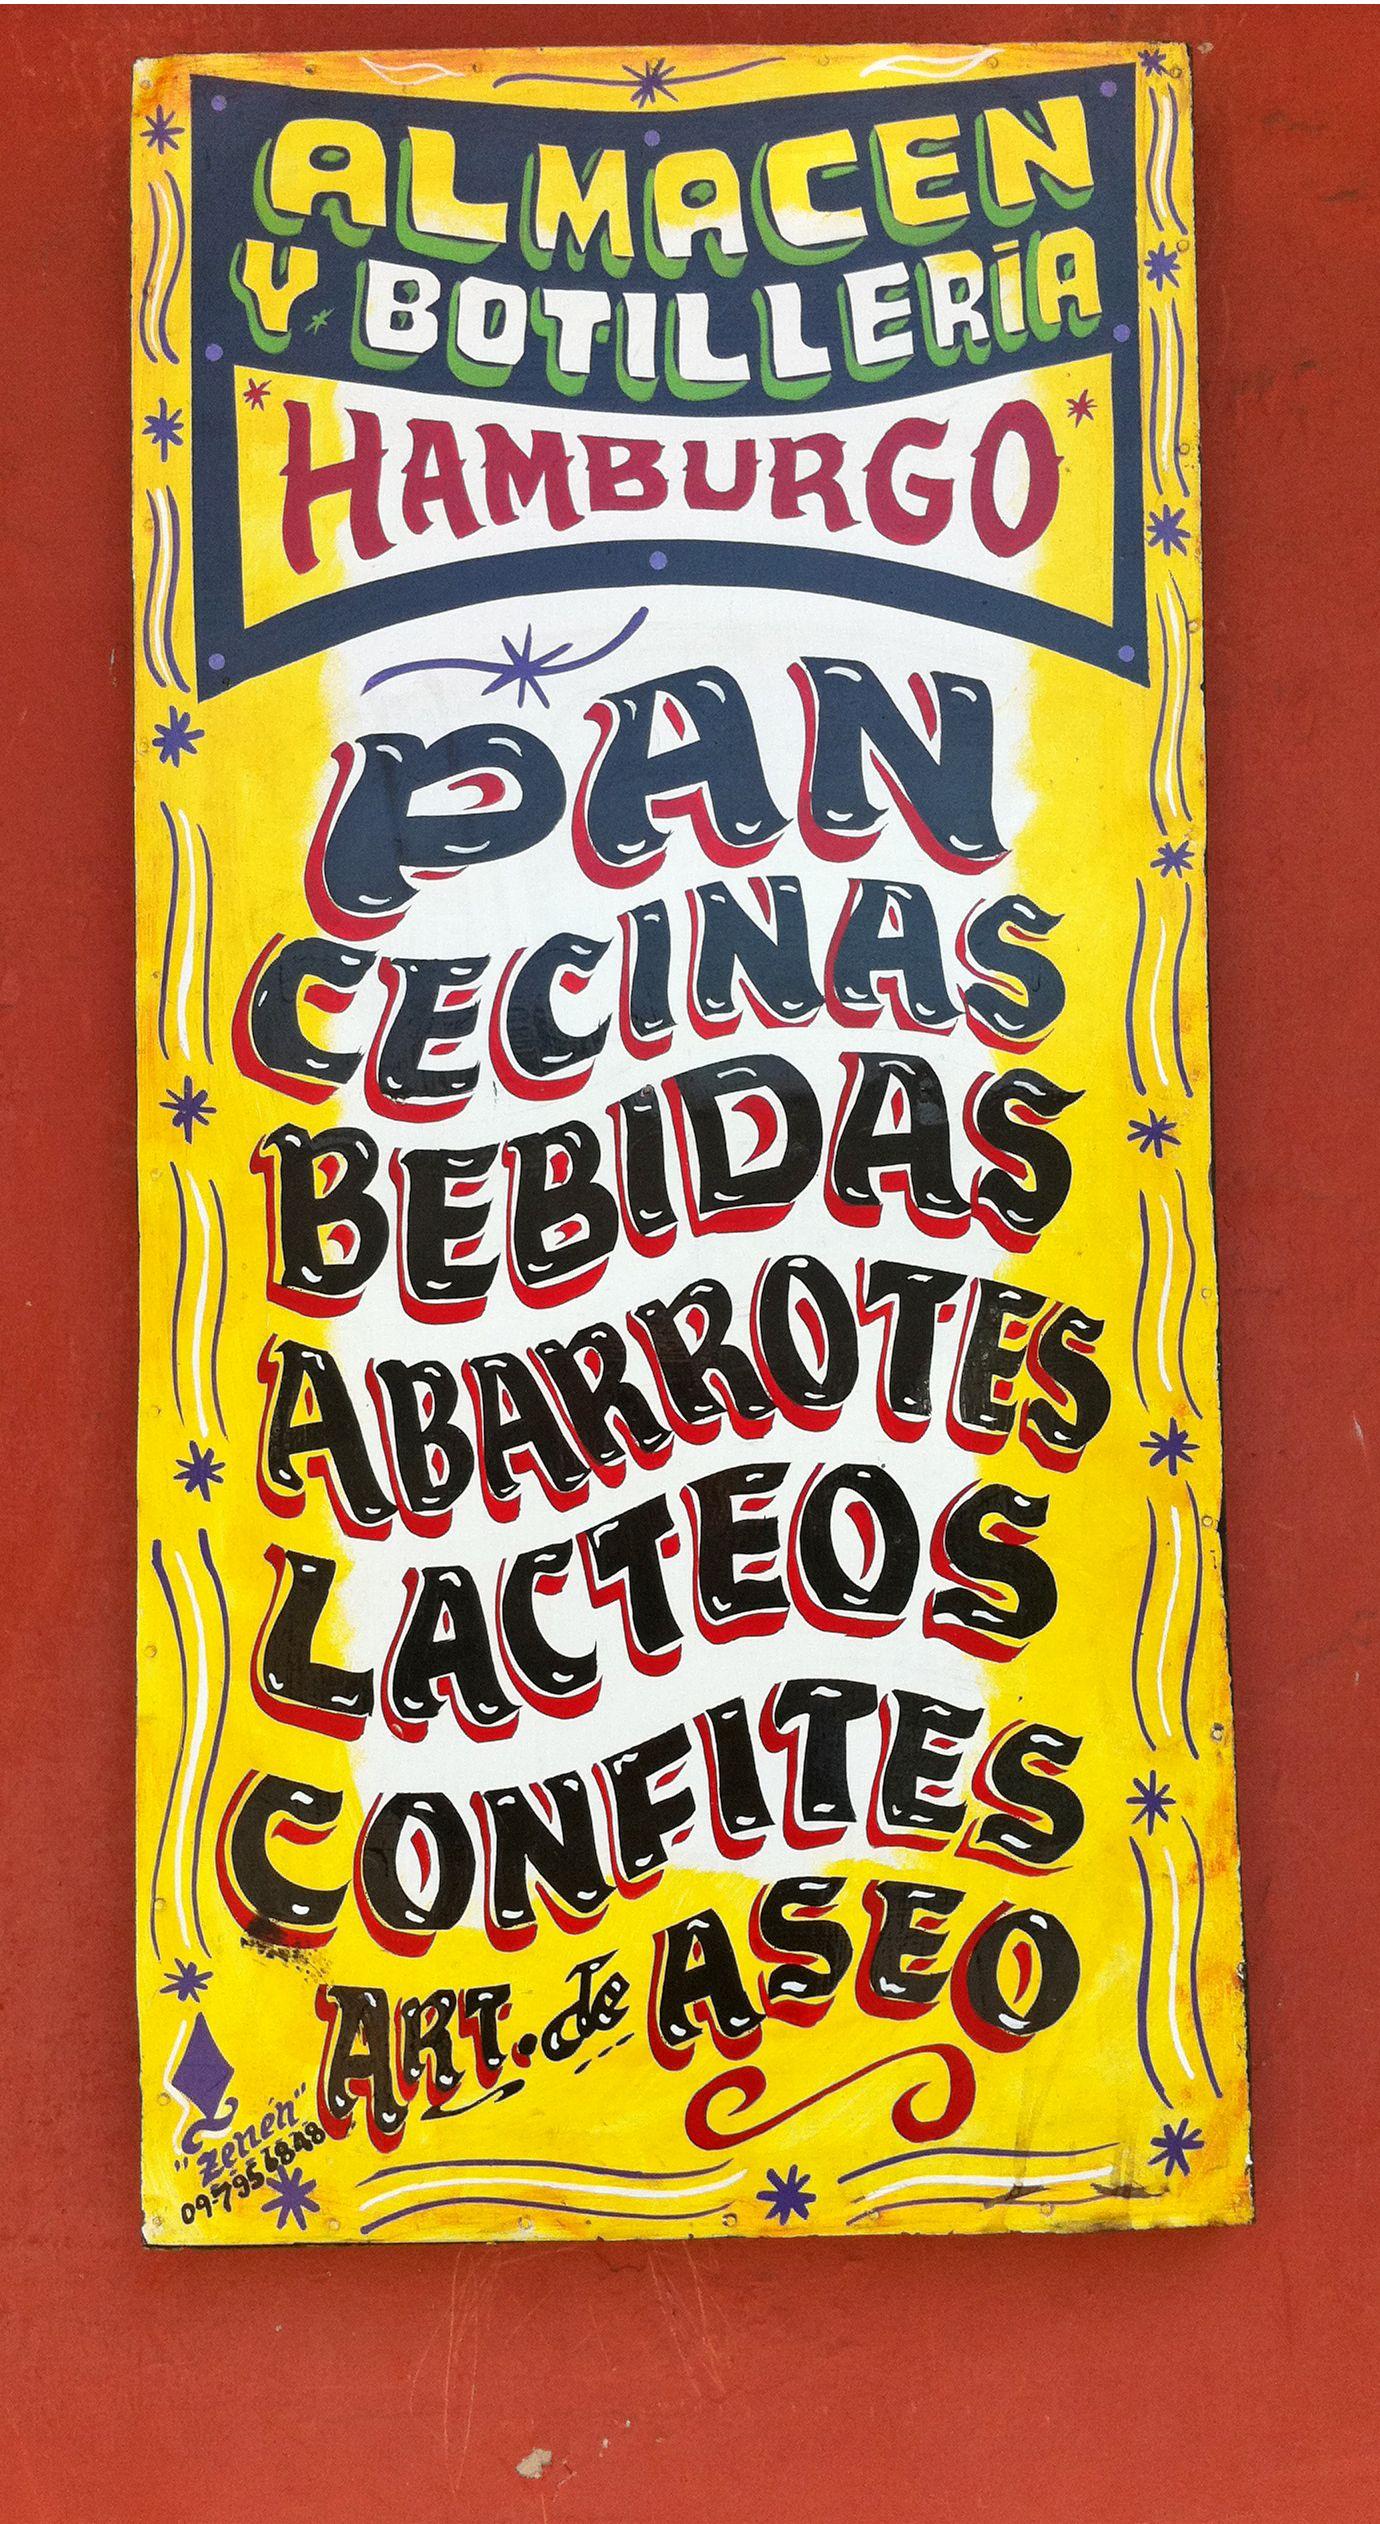 Hand Painted Shop Sign In Santiago Chile Photo By Ellen